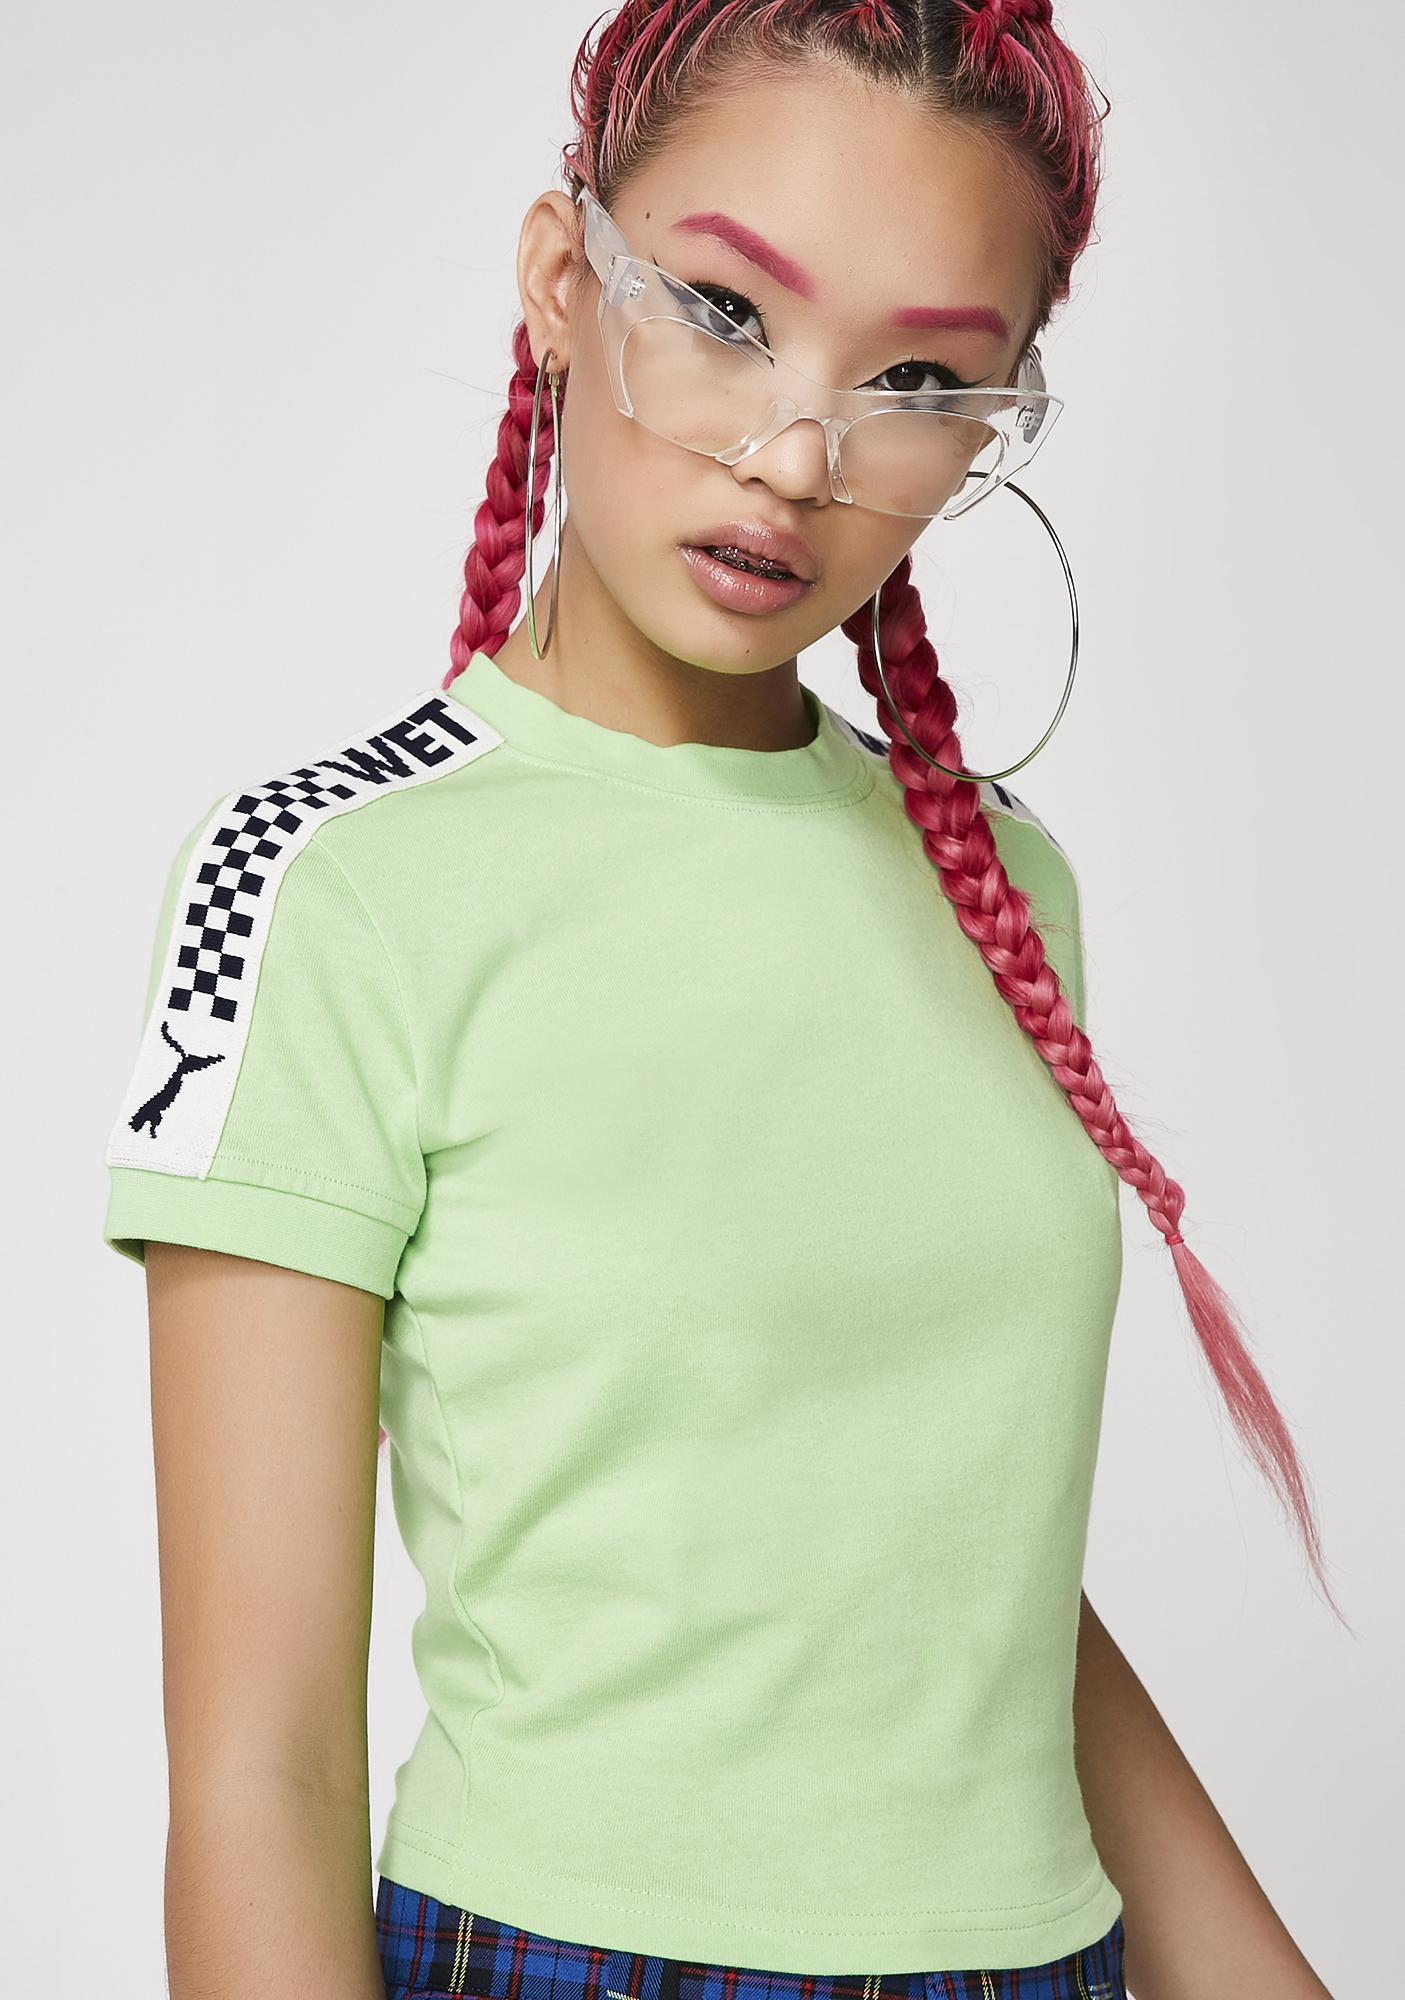 PUMA Gecko FENTY PUMA By Rihanna Short Sleeve Cropped Tee